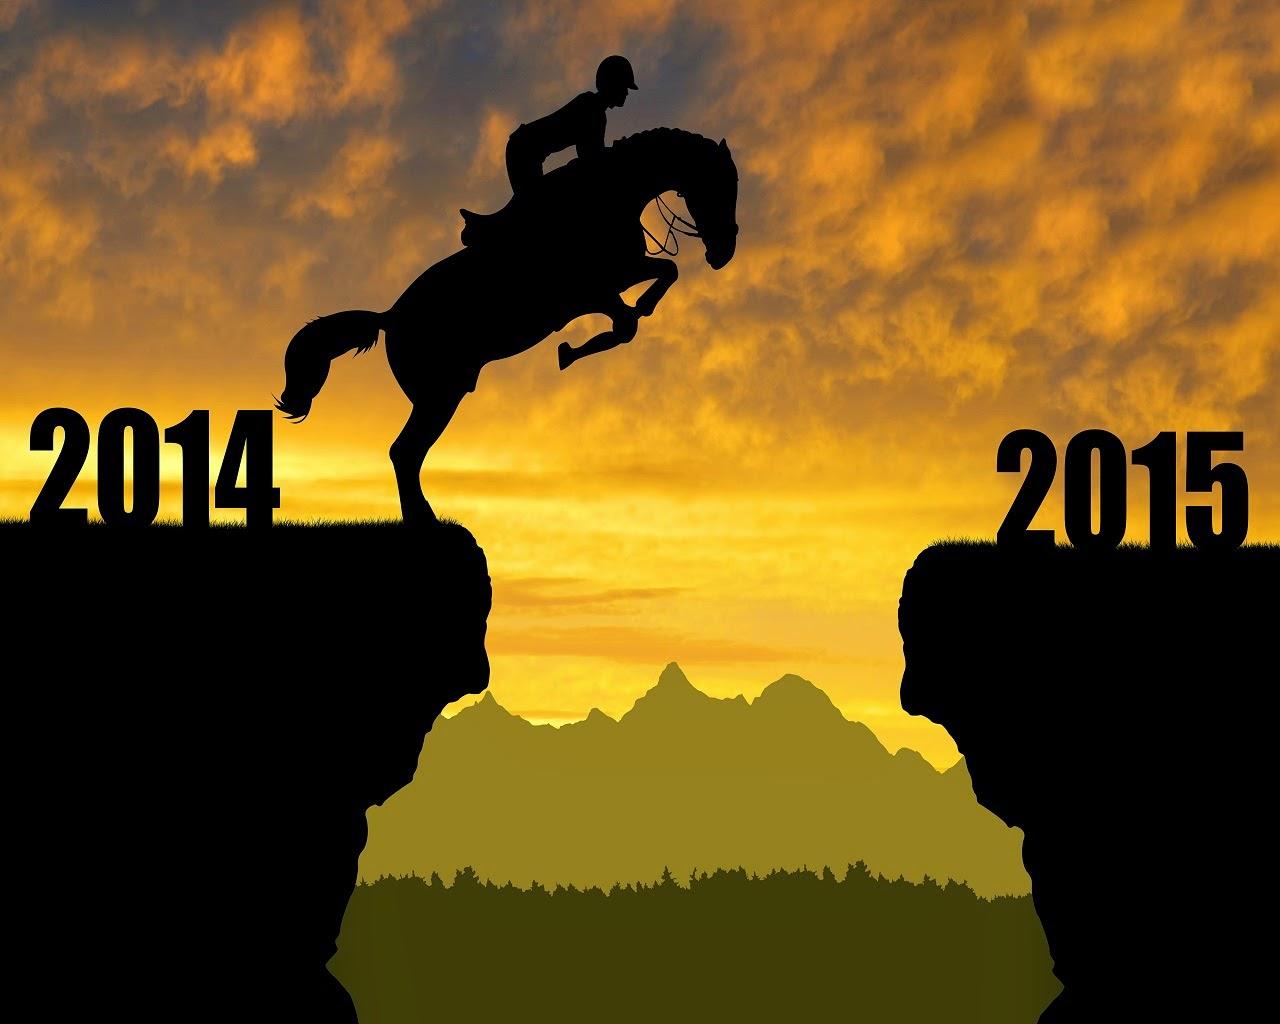 Happy New Year 2015 HD Desktop Background Wallpaper - 1280 x 1024